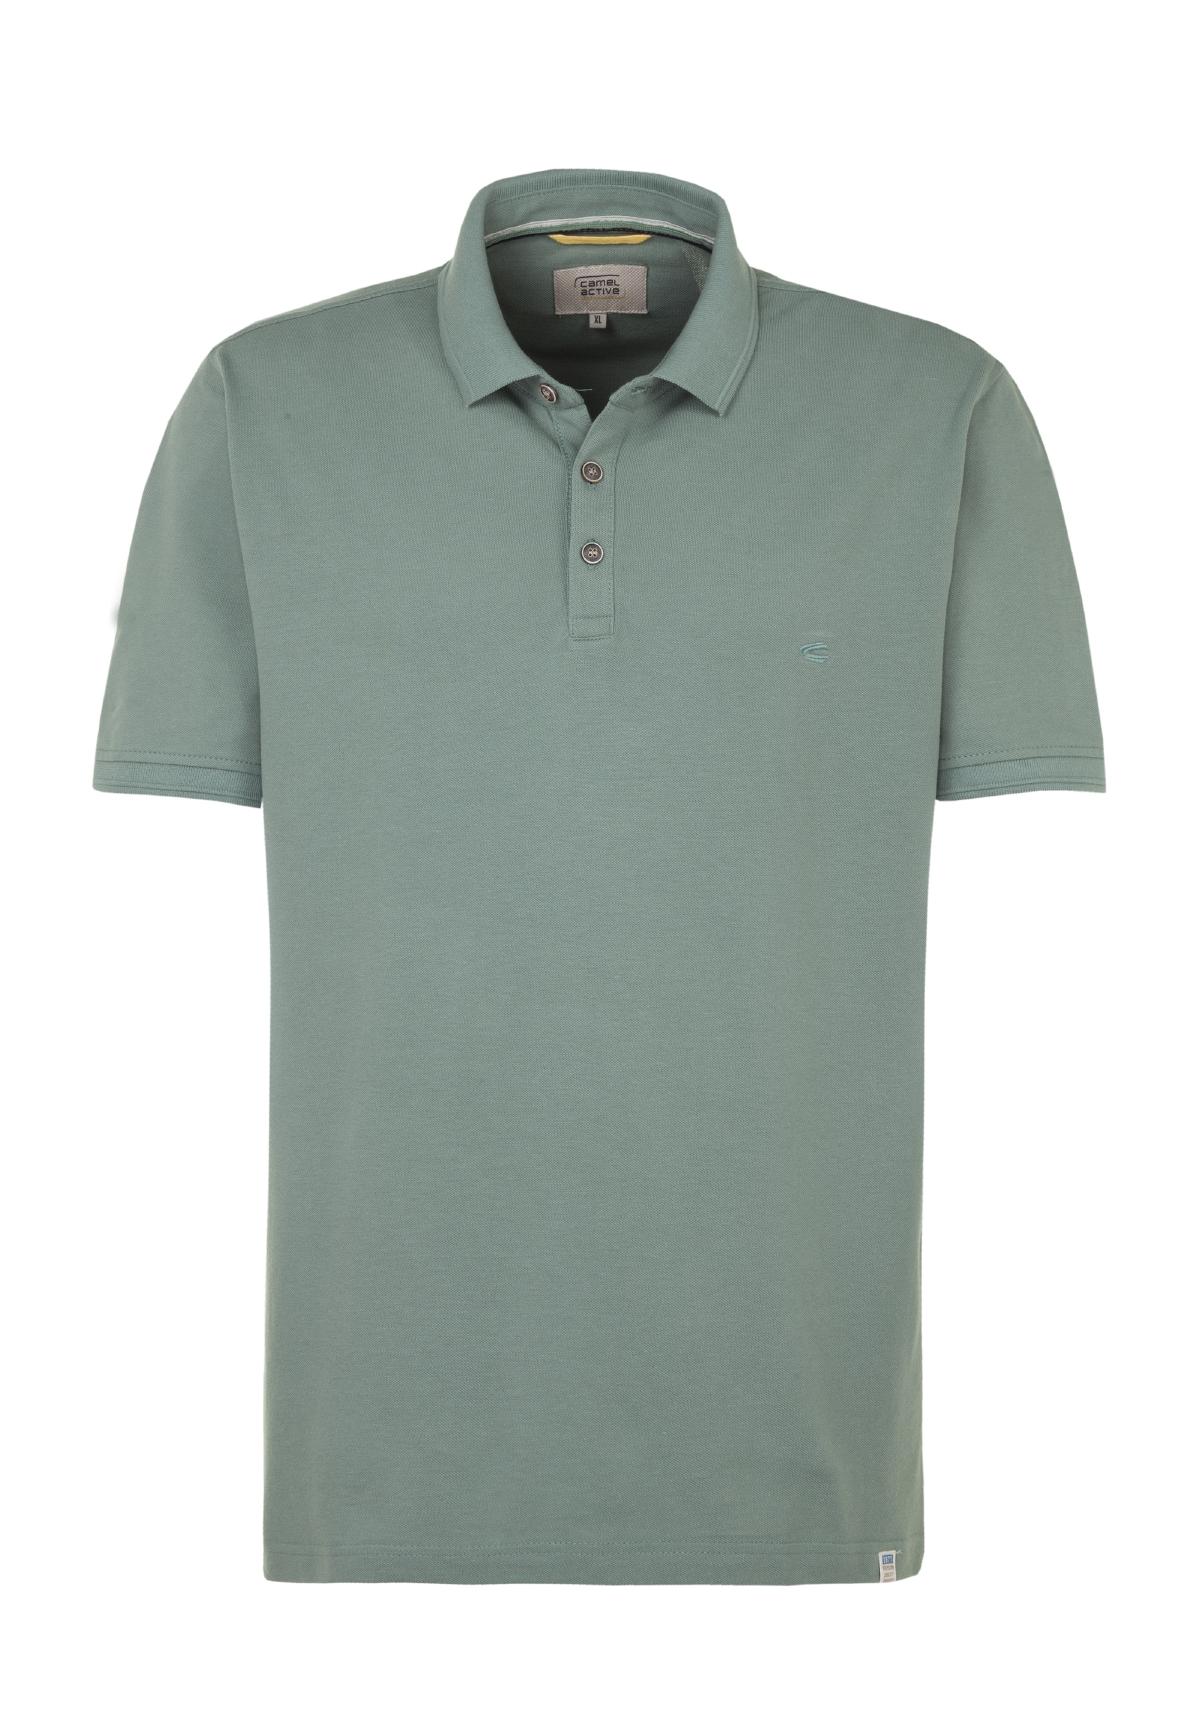 Camel-Active-Herren-Shirt-Poloshirt-Pique-Regular-Fit-NEU Indexbild 87